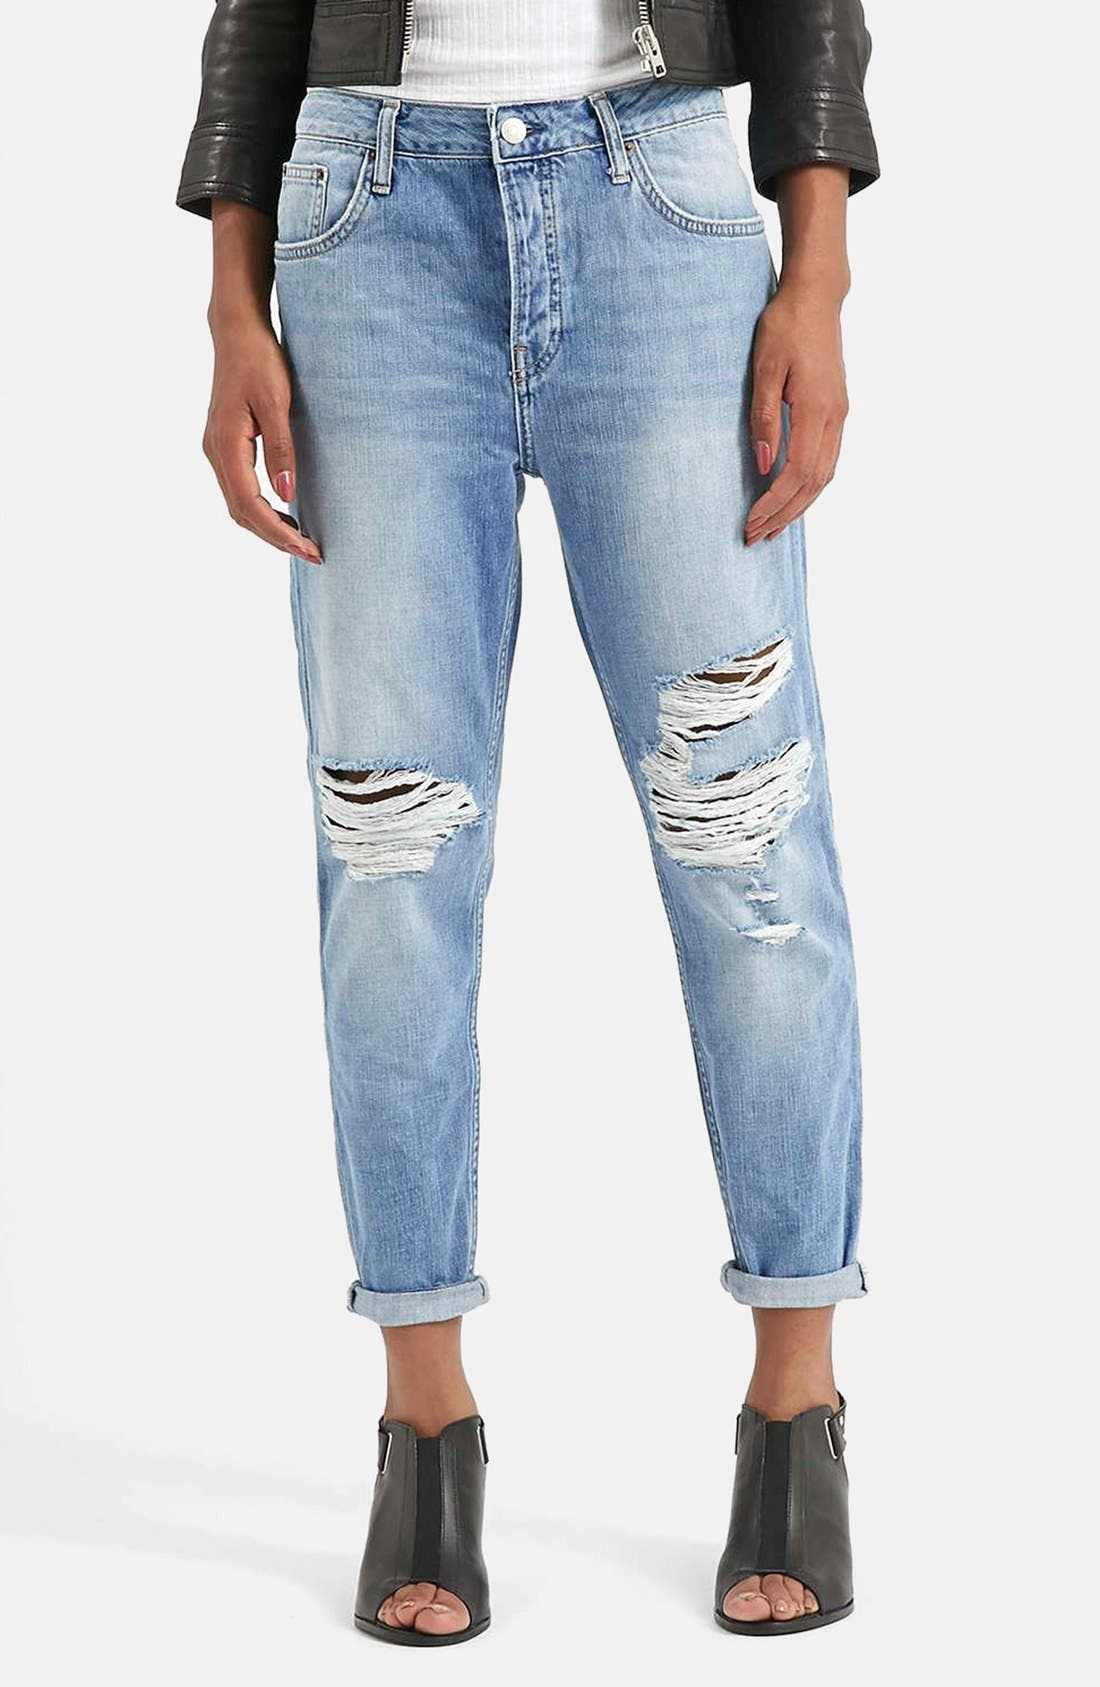 Alternate Image 1 Selected - Topshop Moto 'Hayden' Ripped Boyfriend Jeans (Blue)